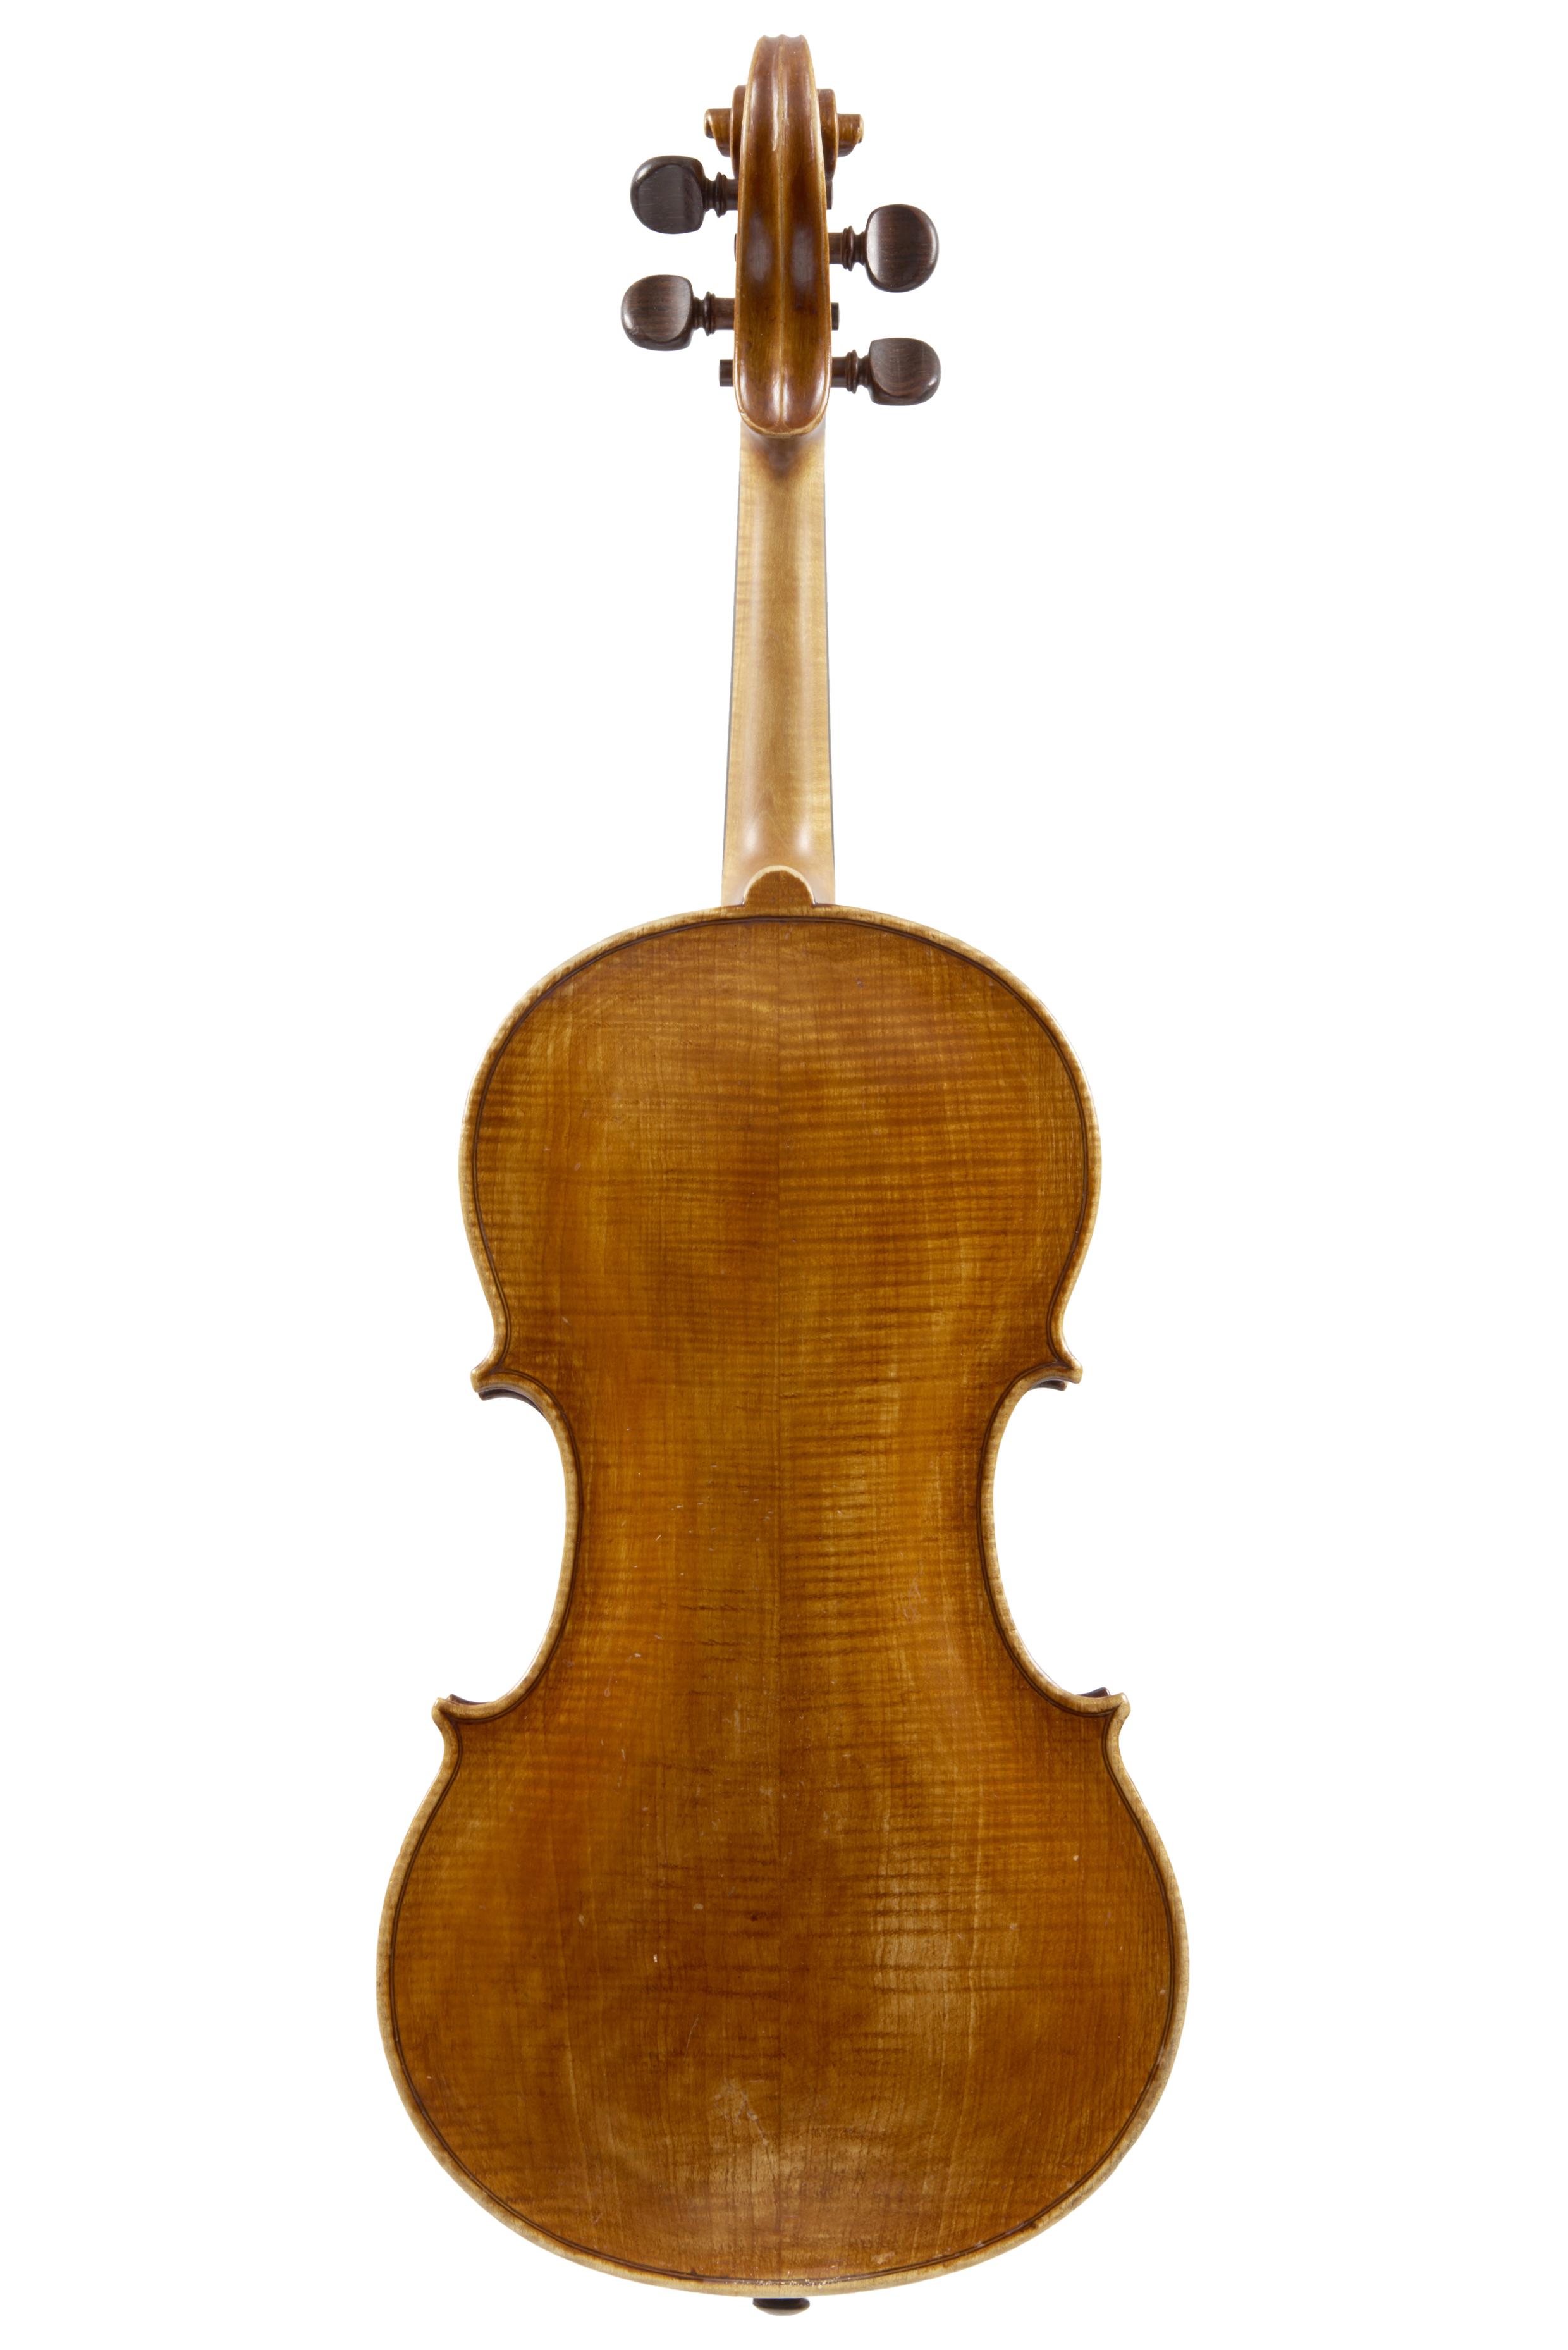 PROBABLY BY GIUSEPPE SGARBI (b Finale Emilia, 1818; d Modena, 1905) A VIOLIN MODENA SECOND HALF OF